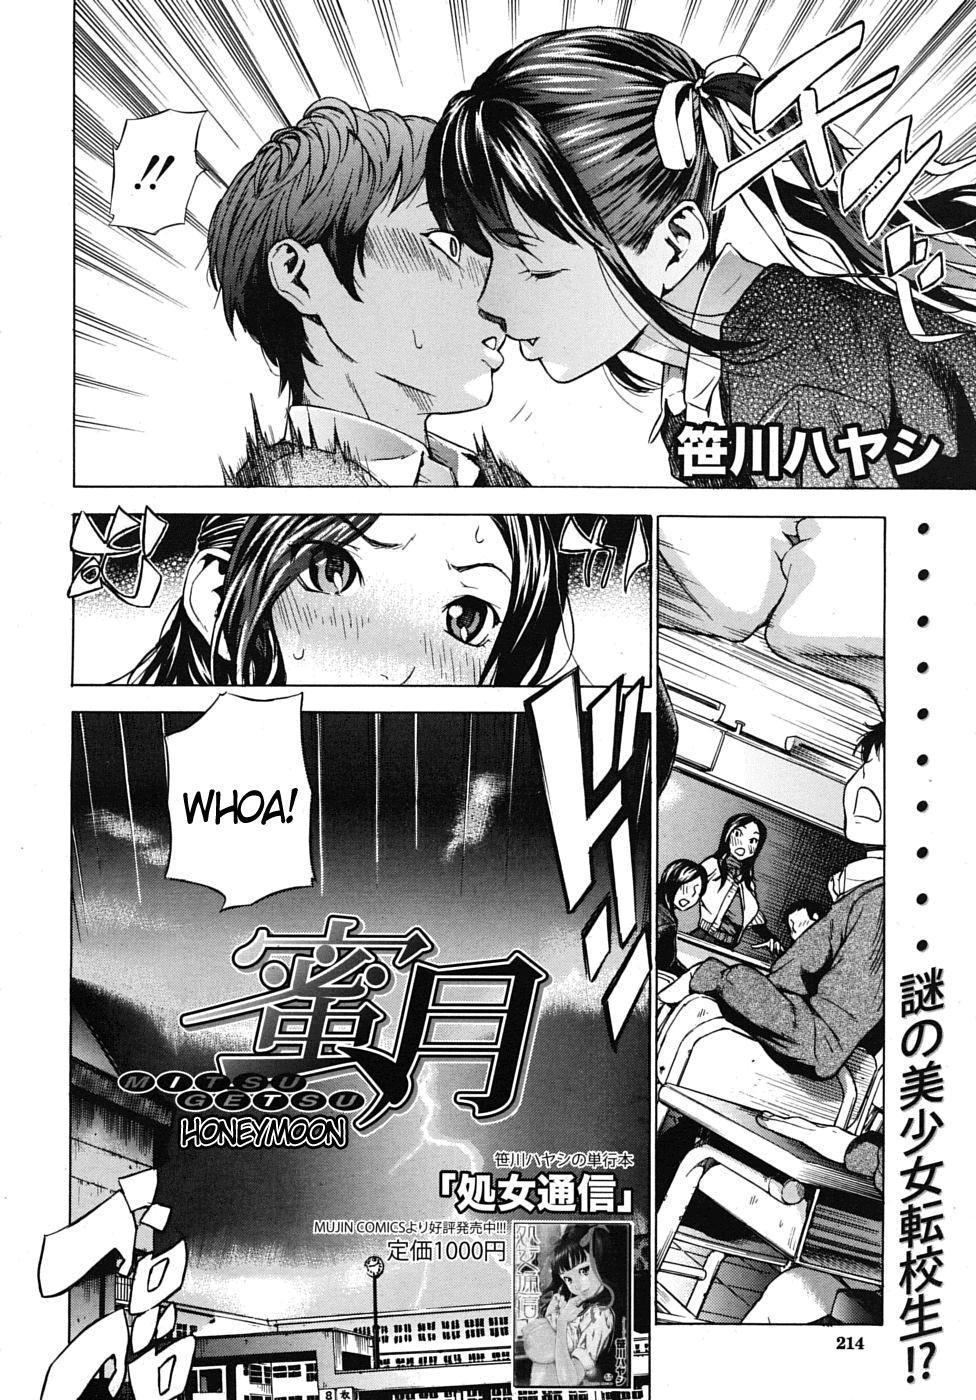 [Sasagawa Hayashi] Zutto Isshoni - Our Eternity Love Ch. 1-6 [English] [DGB+Hei and Yin] 50